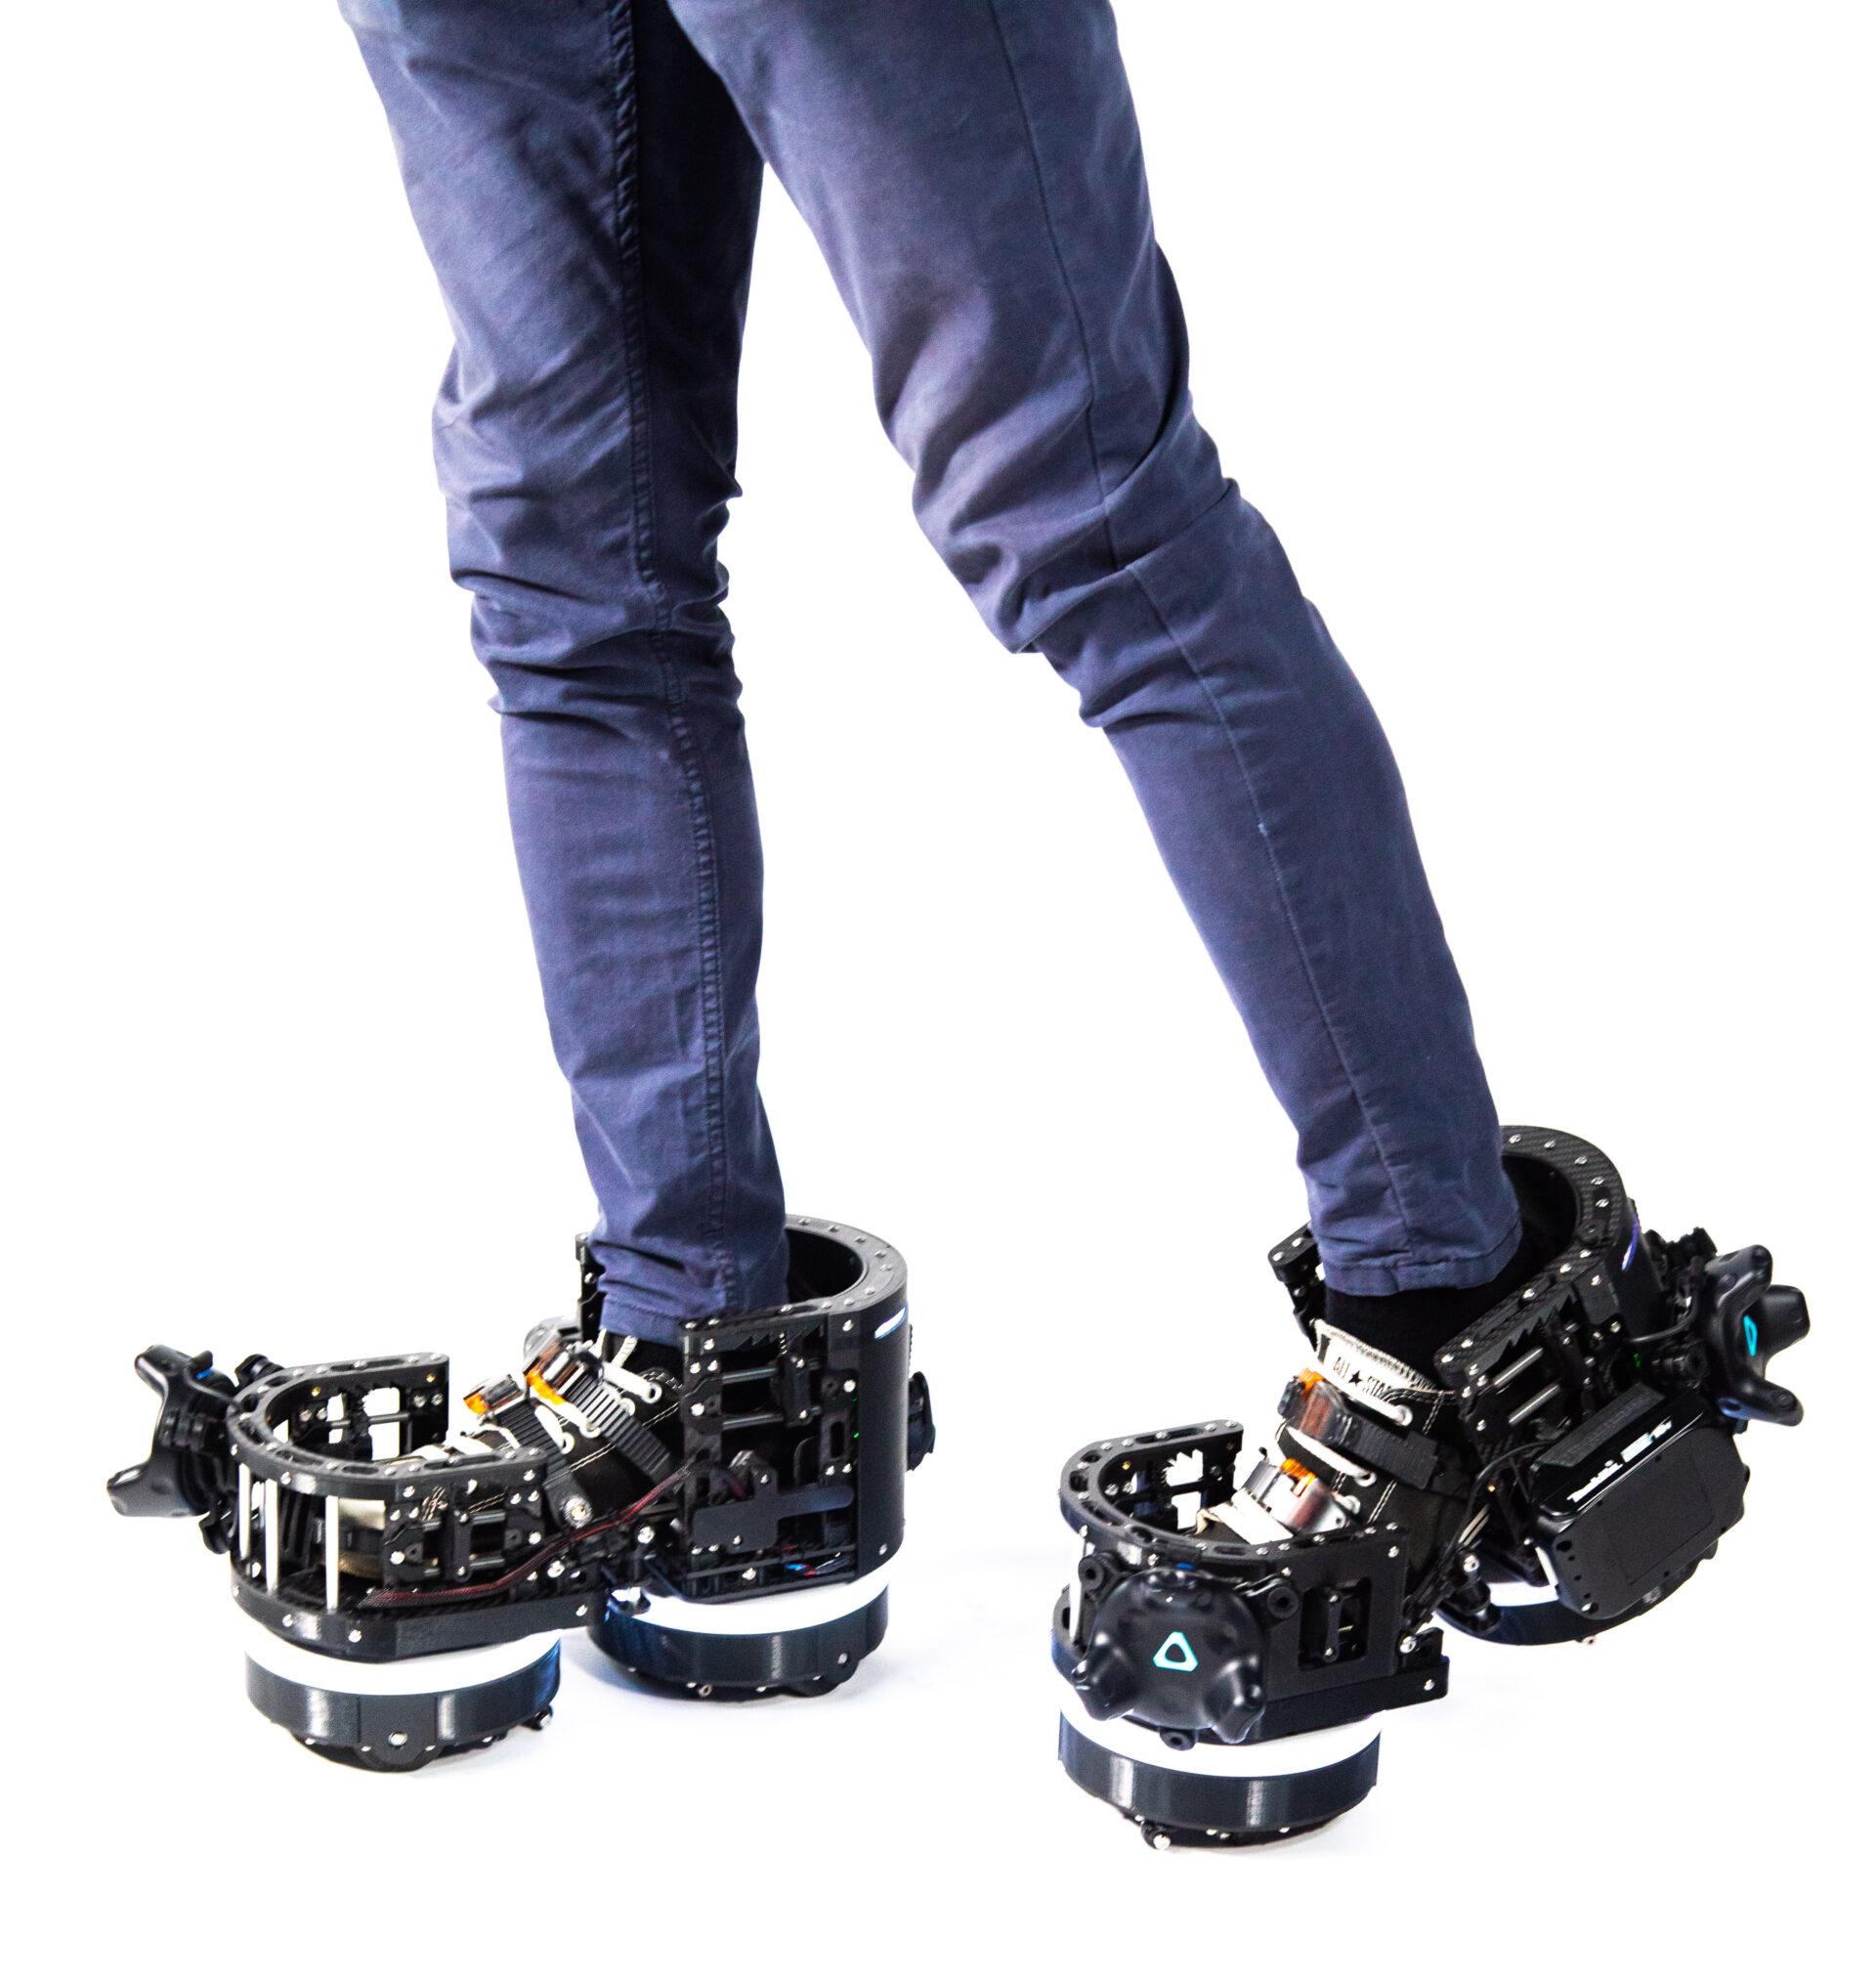 Ekto VR Robotics Boots-09-2